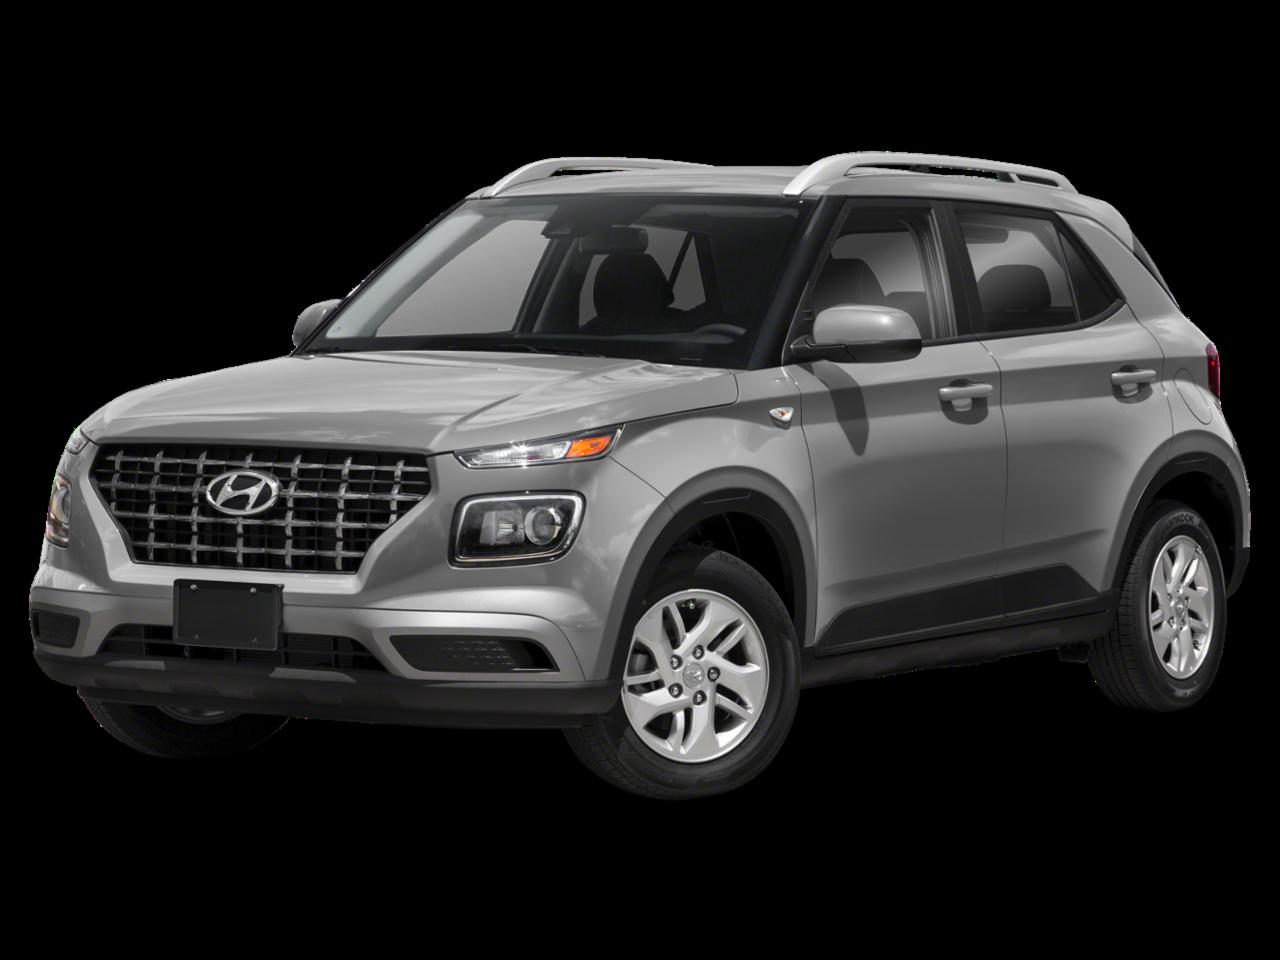 Hyundai 2021 Venue SEL